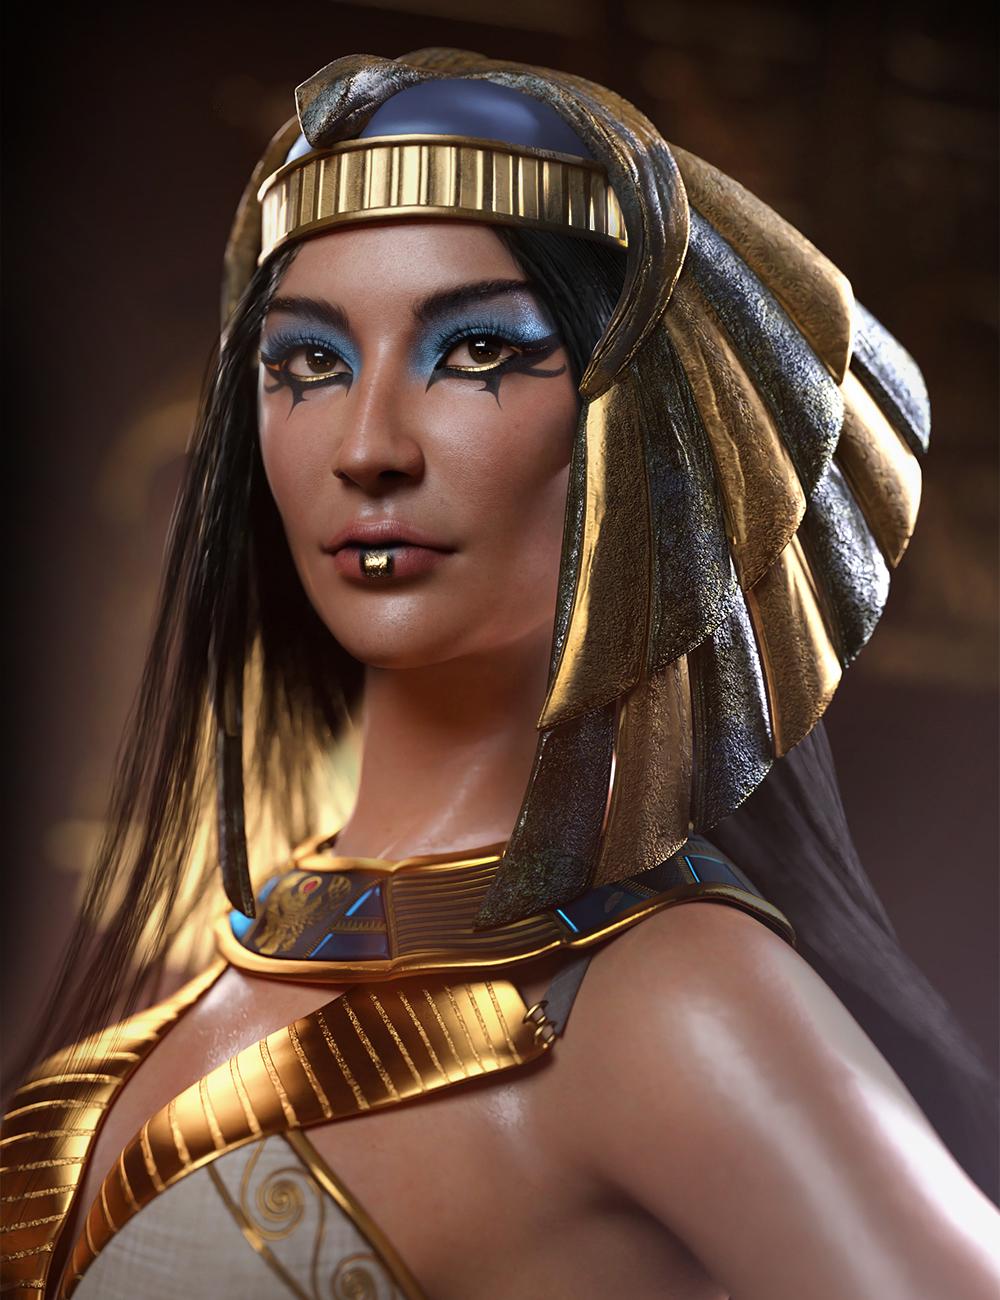 Egyptian Pharaoh Makeup by: SR3, 3D Models by Daz 3D